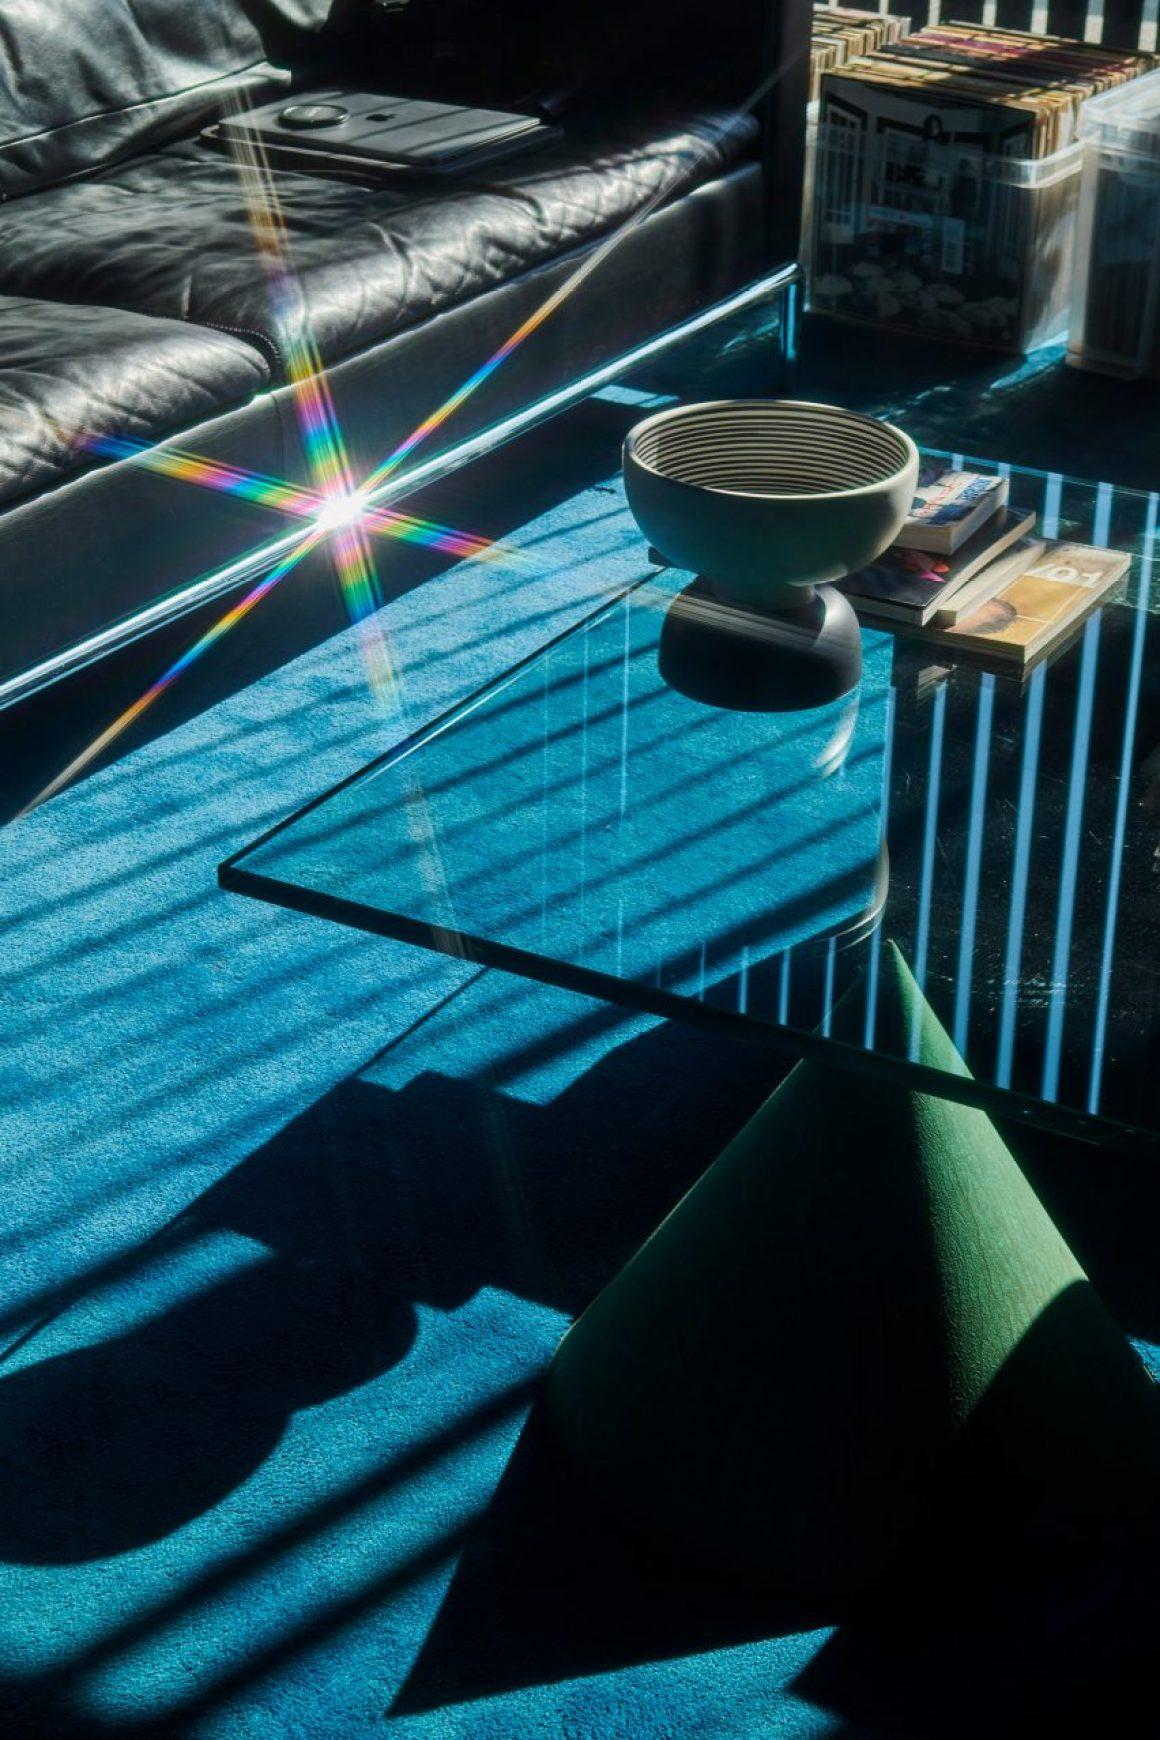 Glass coffee table in Soulwax studio by Glenn Sestig